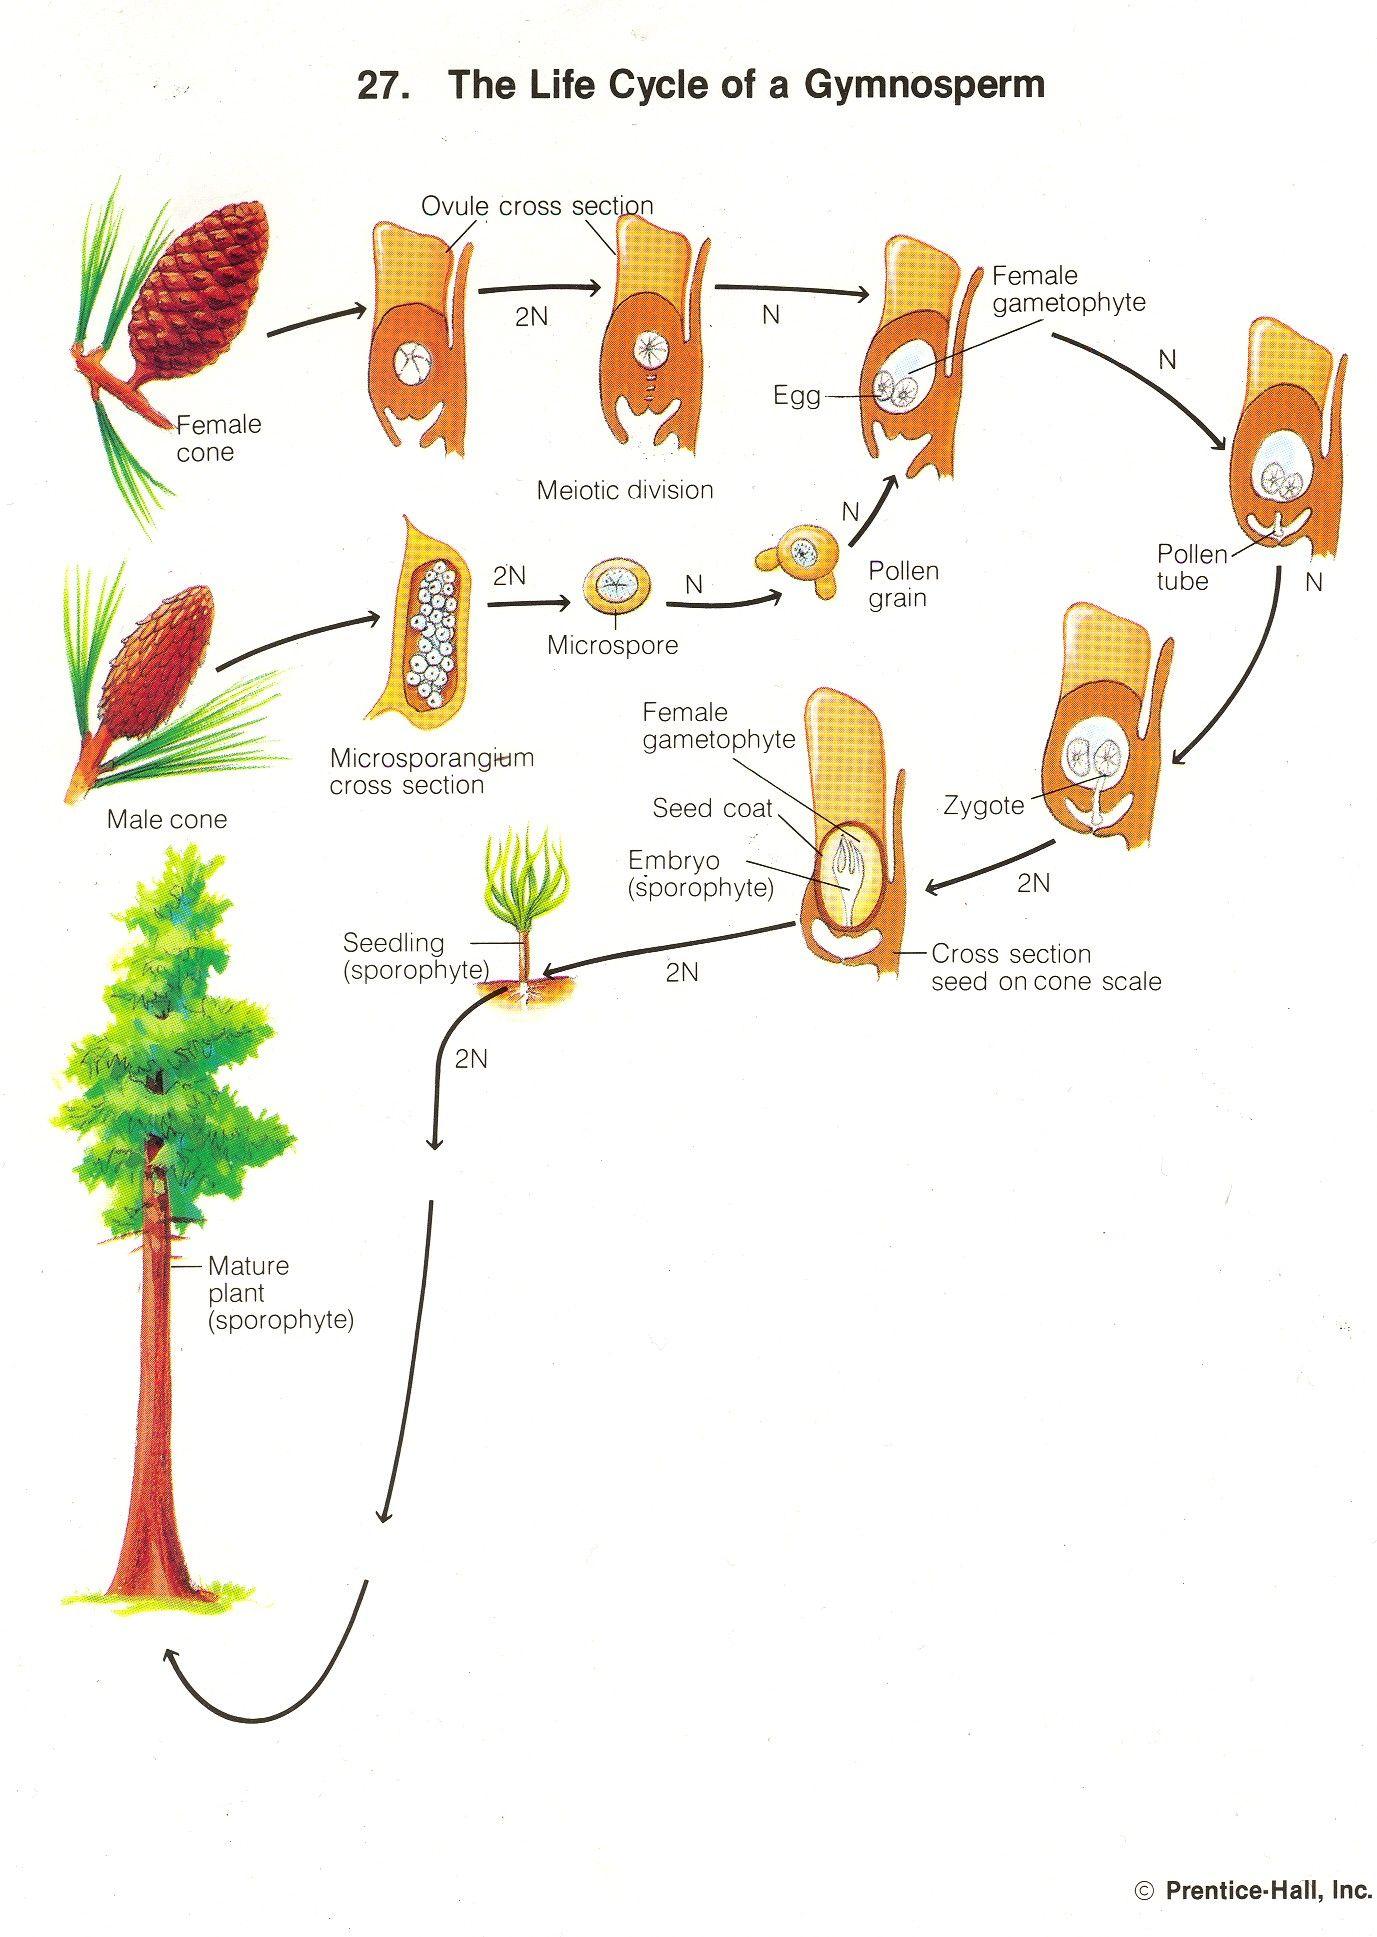 Gymnosperm Life Cycle